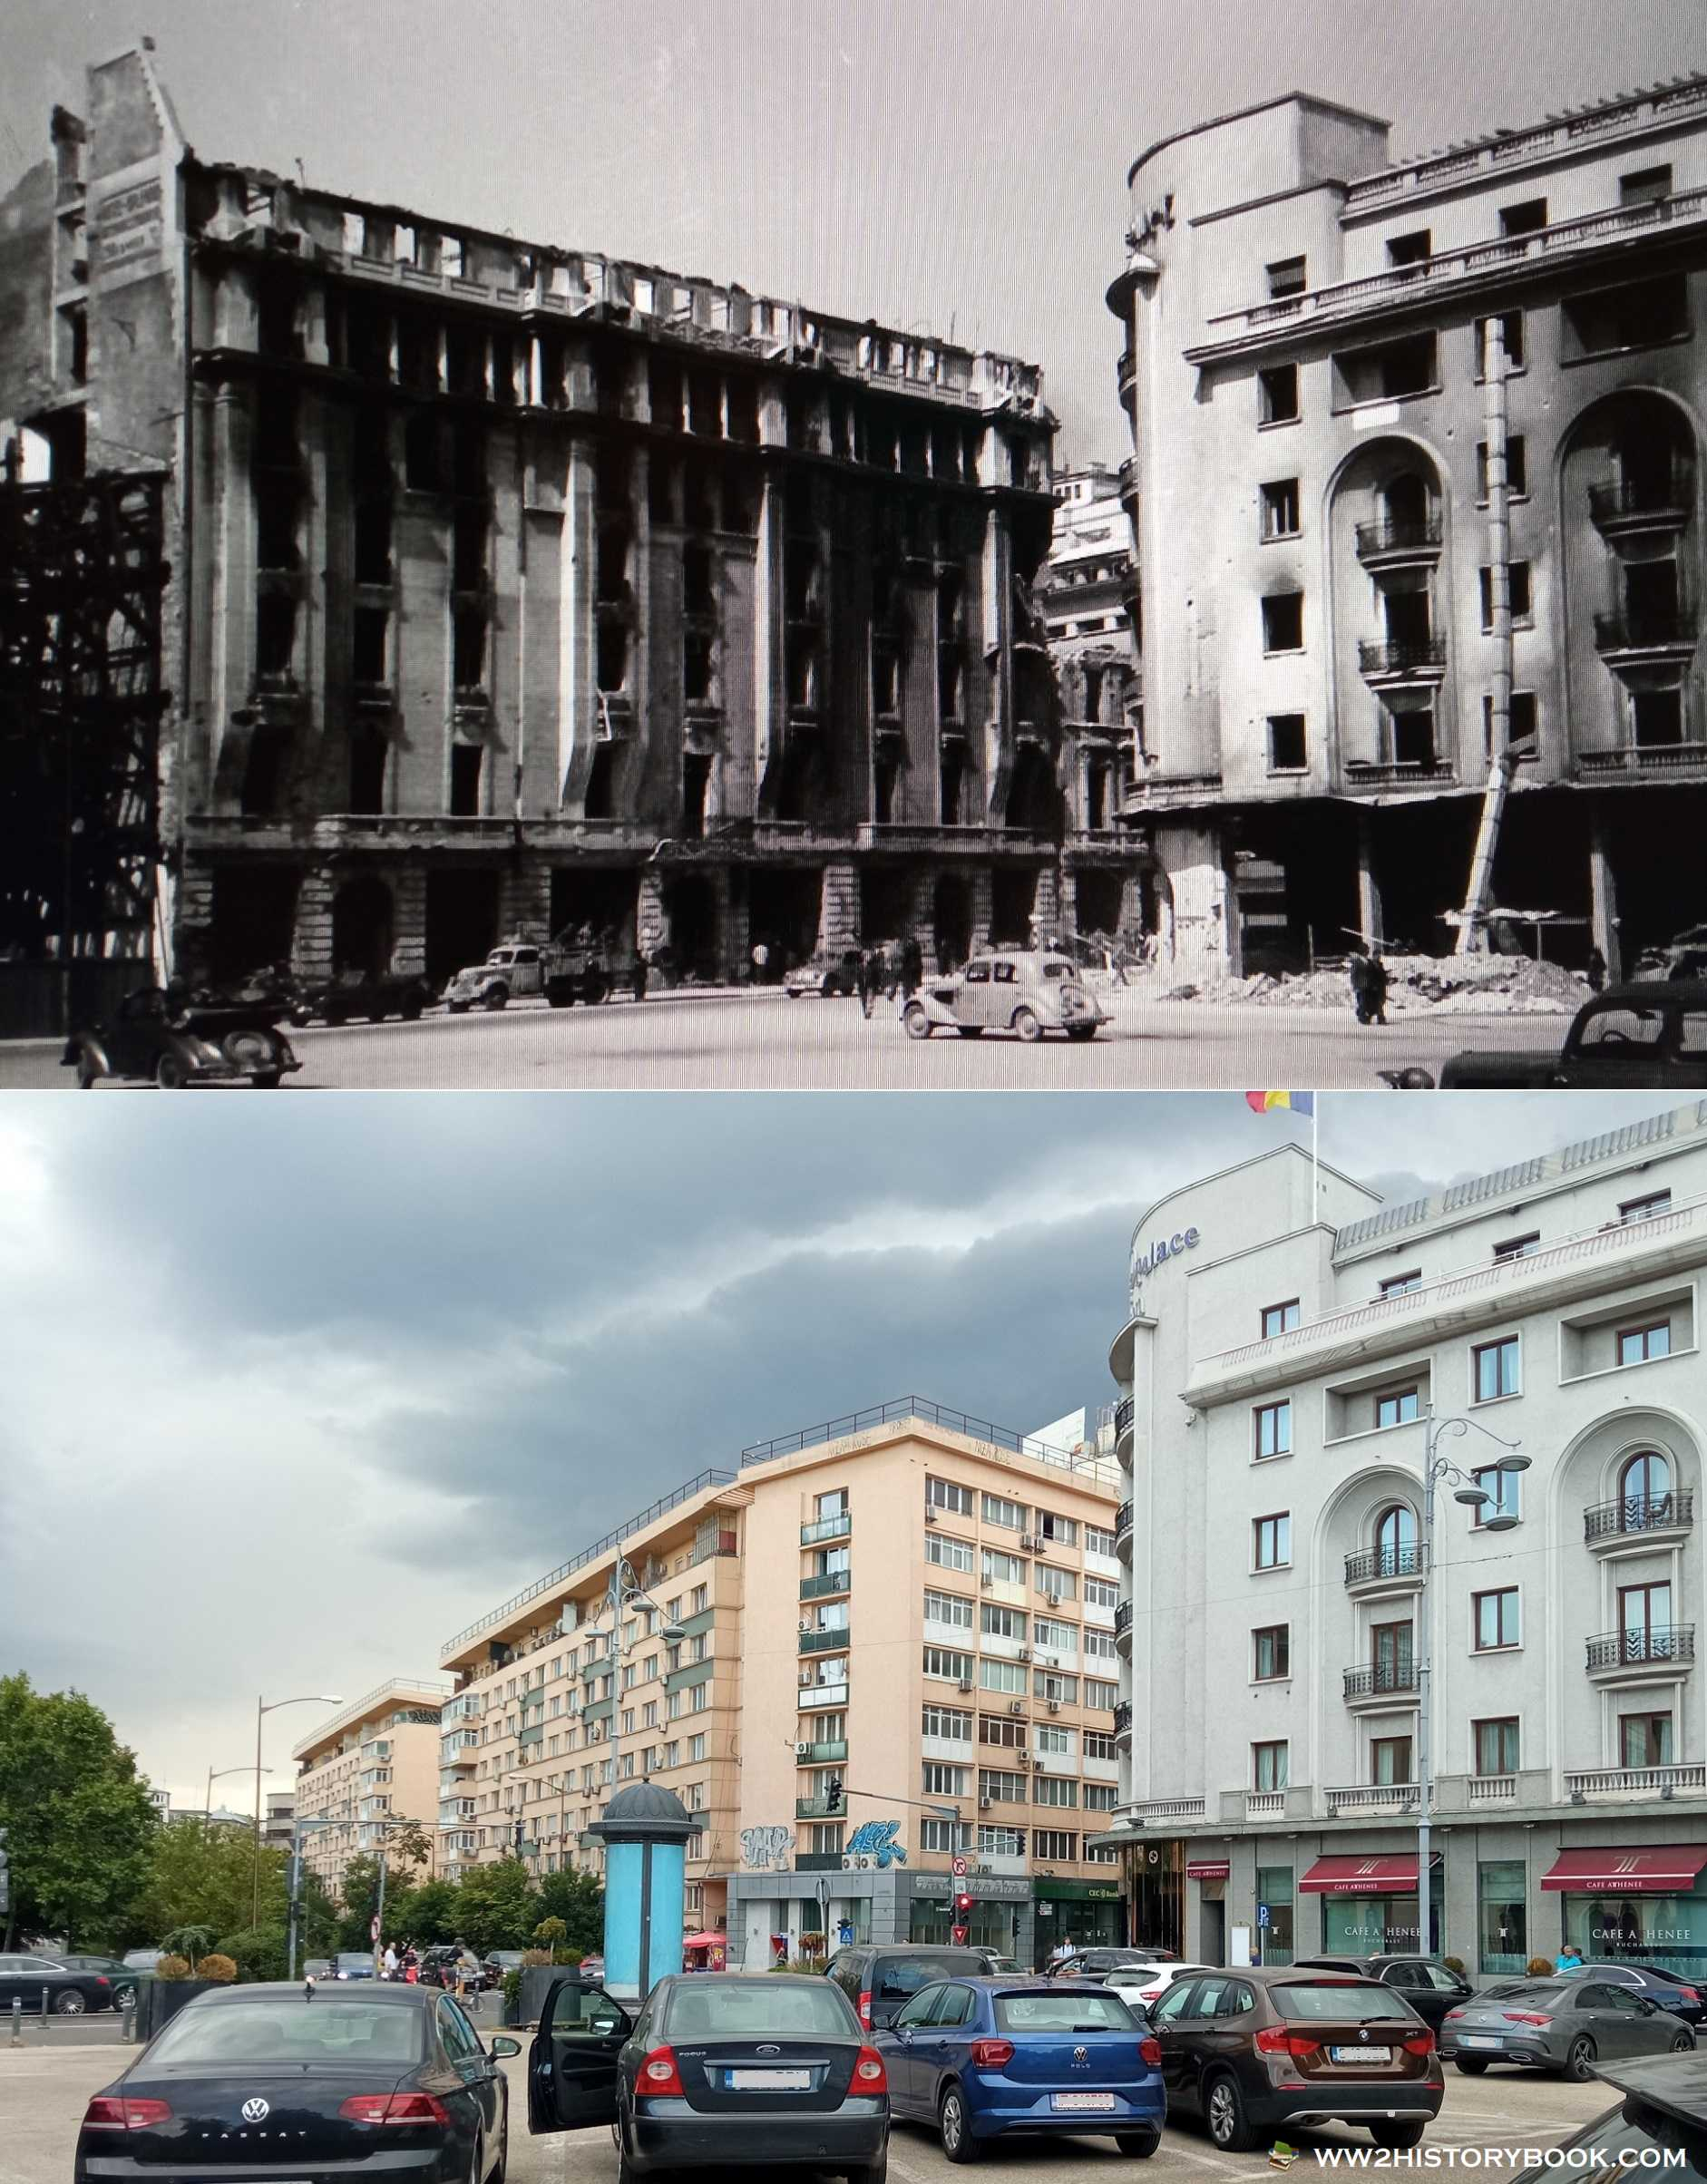 athenee palace hotel world war 2 bombing